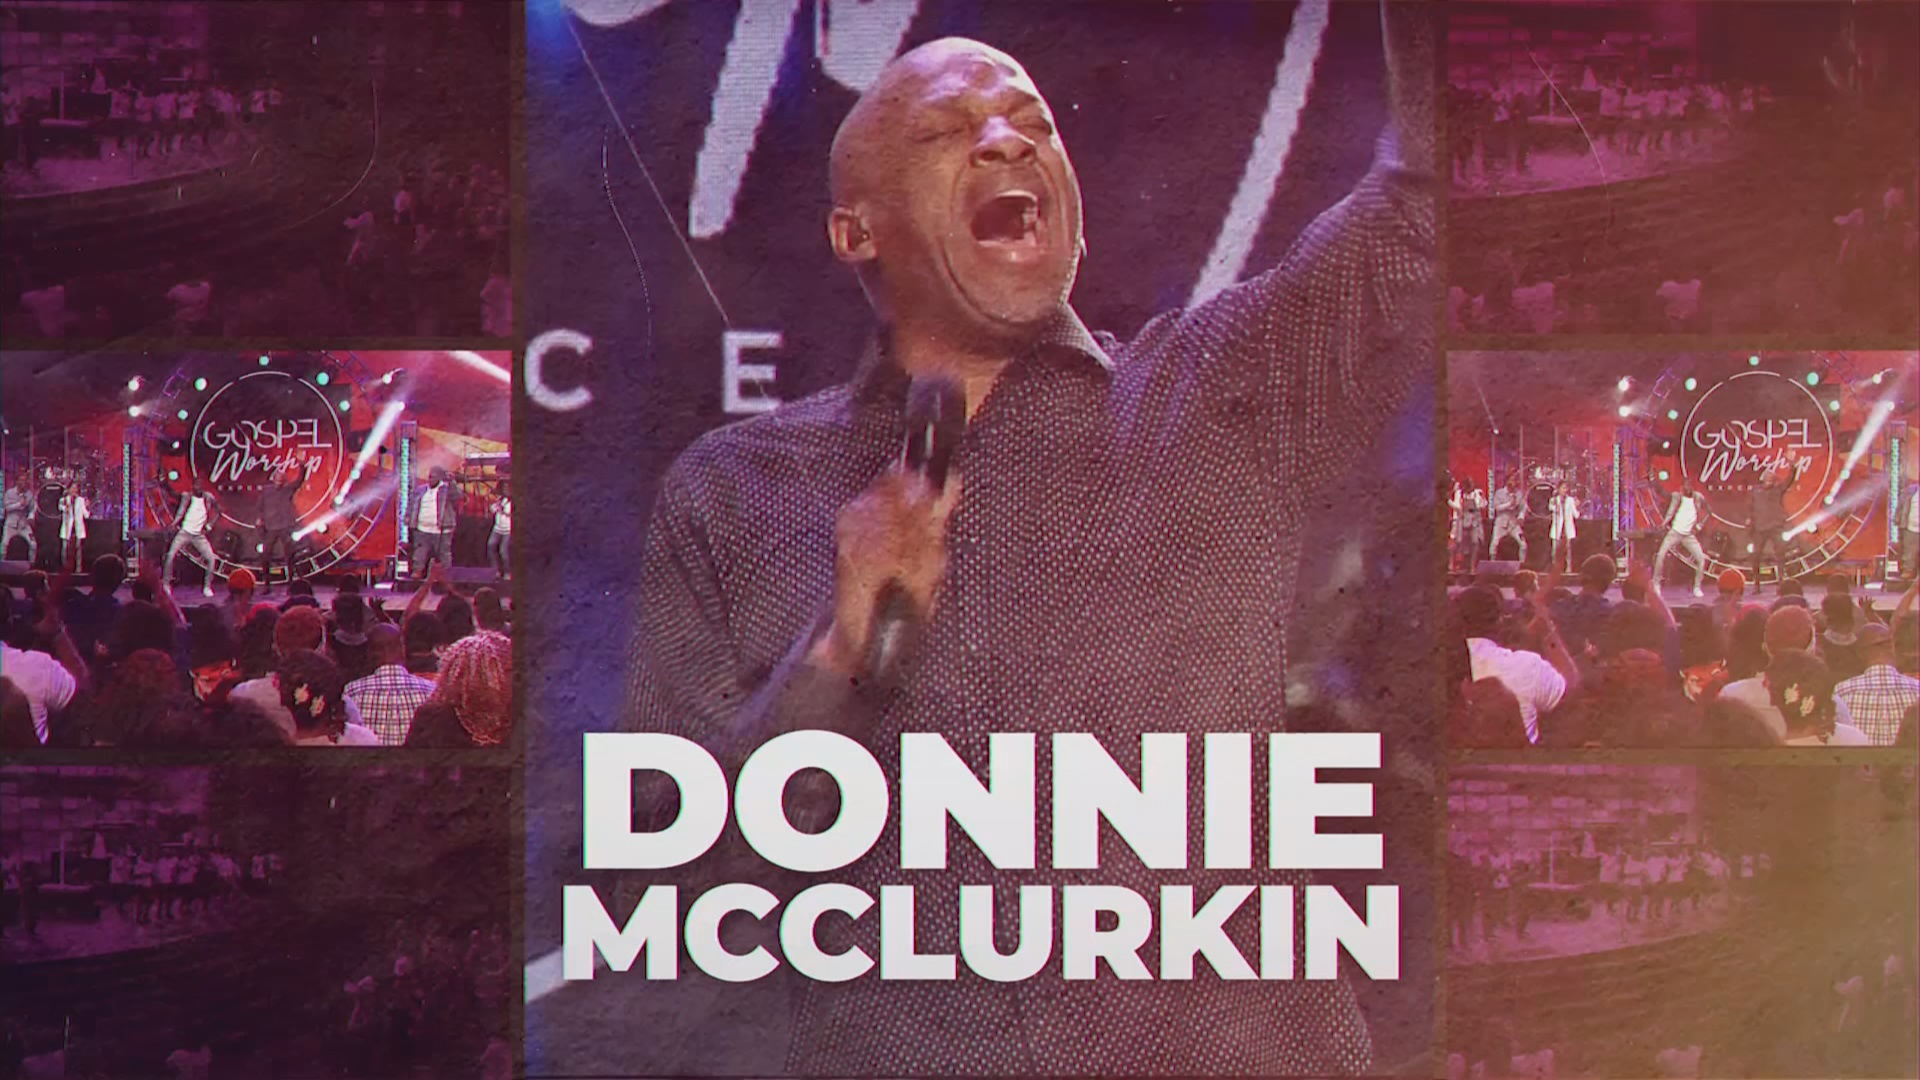 Donnie McClurkin 2